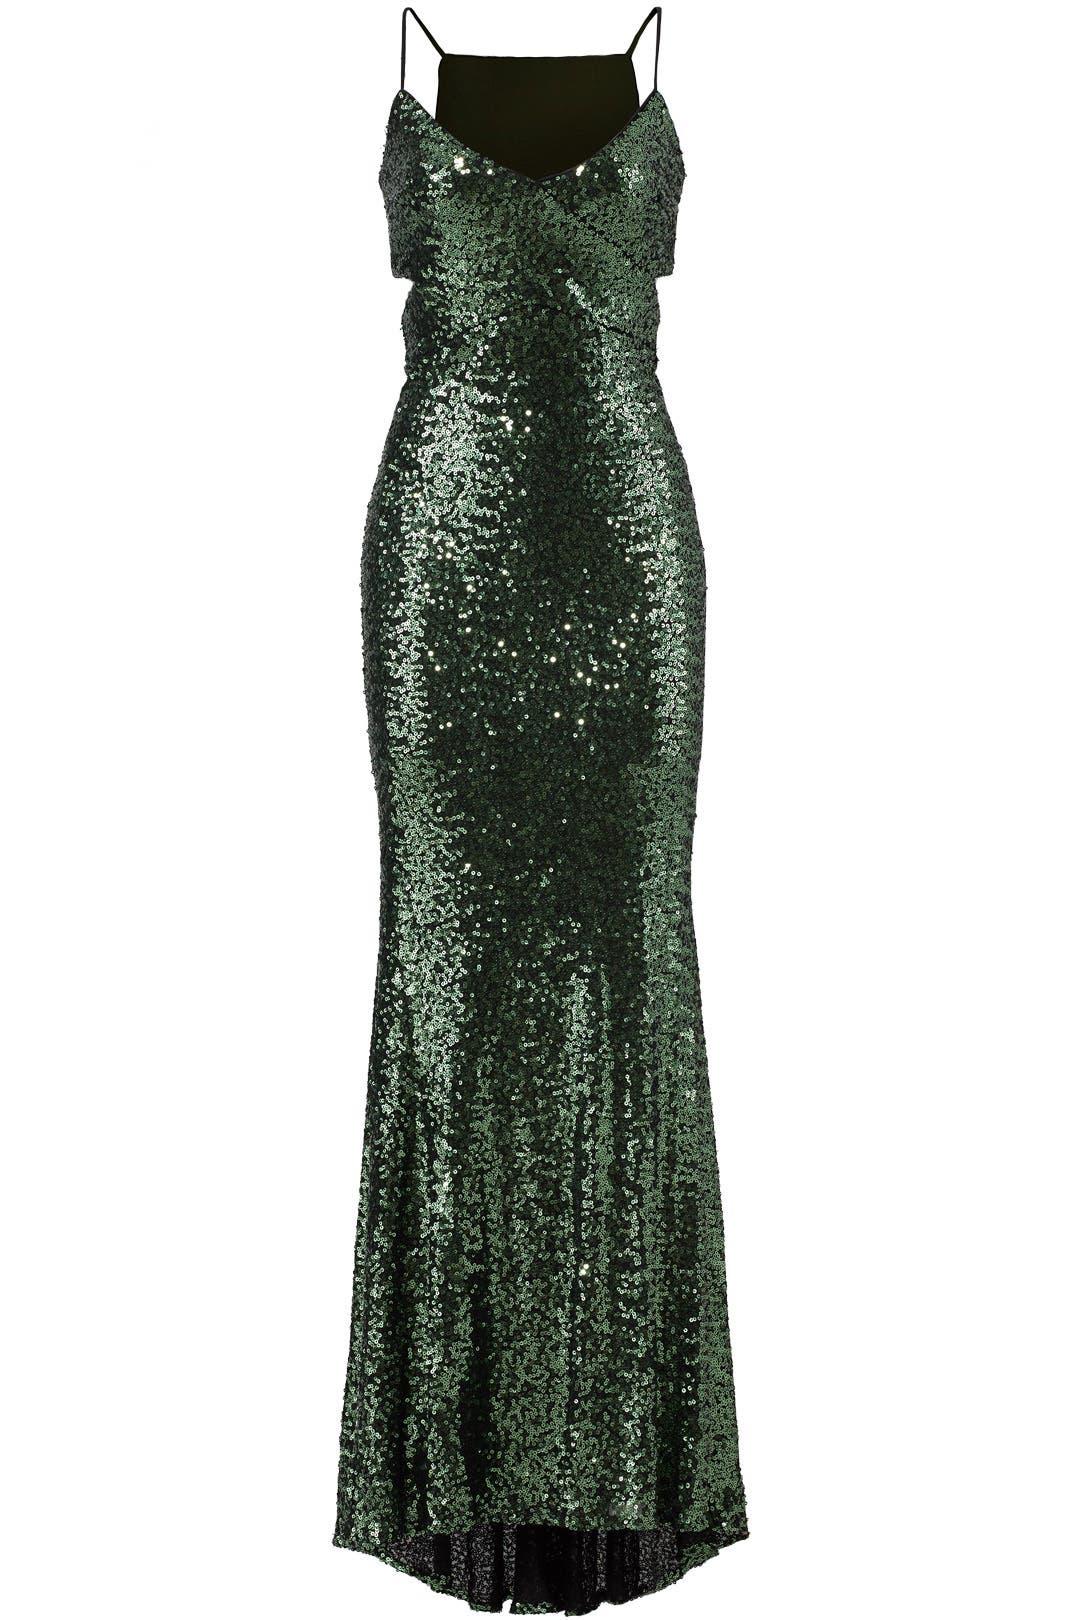 Emerald Sequin Gown by Badgley Mischka for $70 - $90 | Rent the Runway